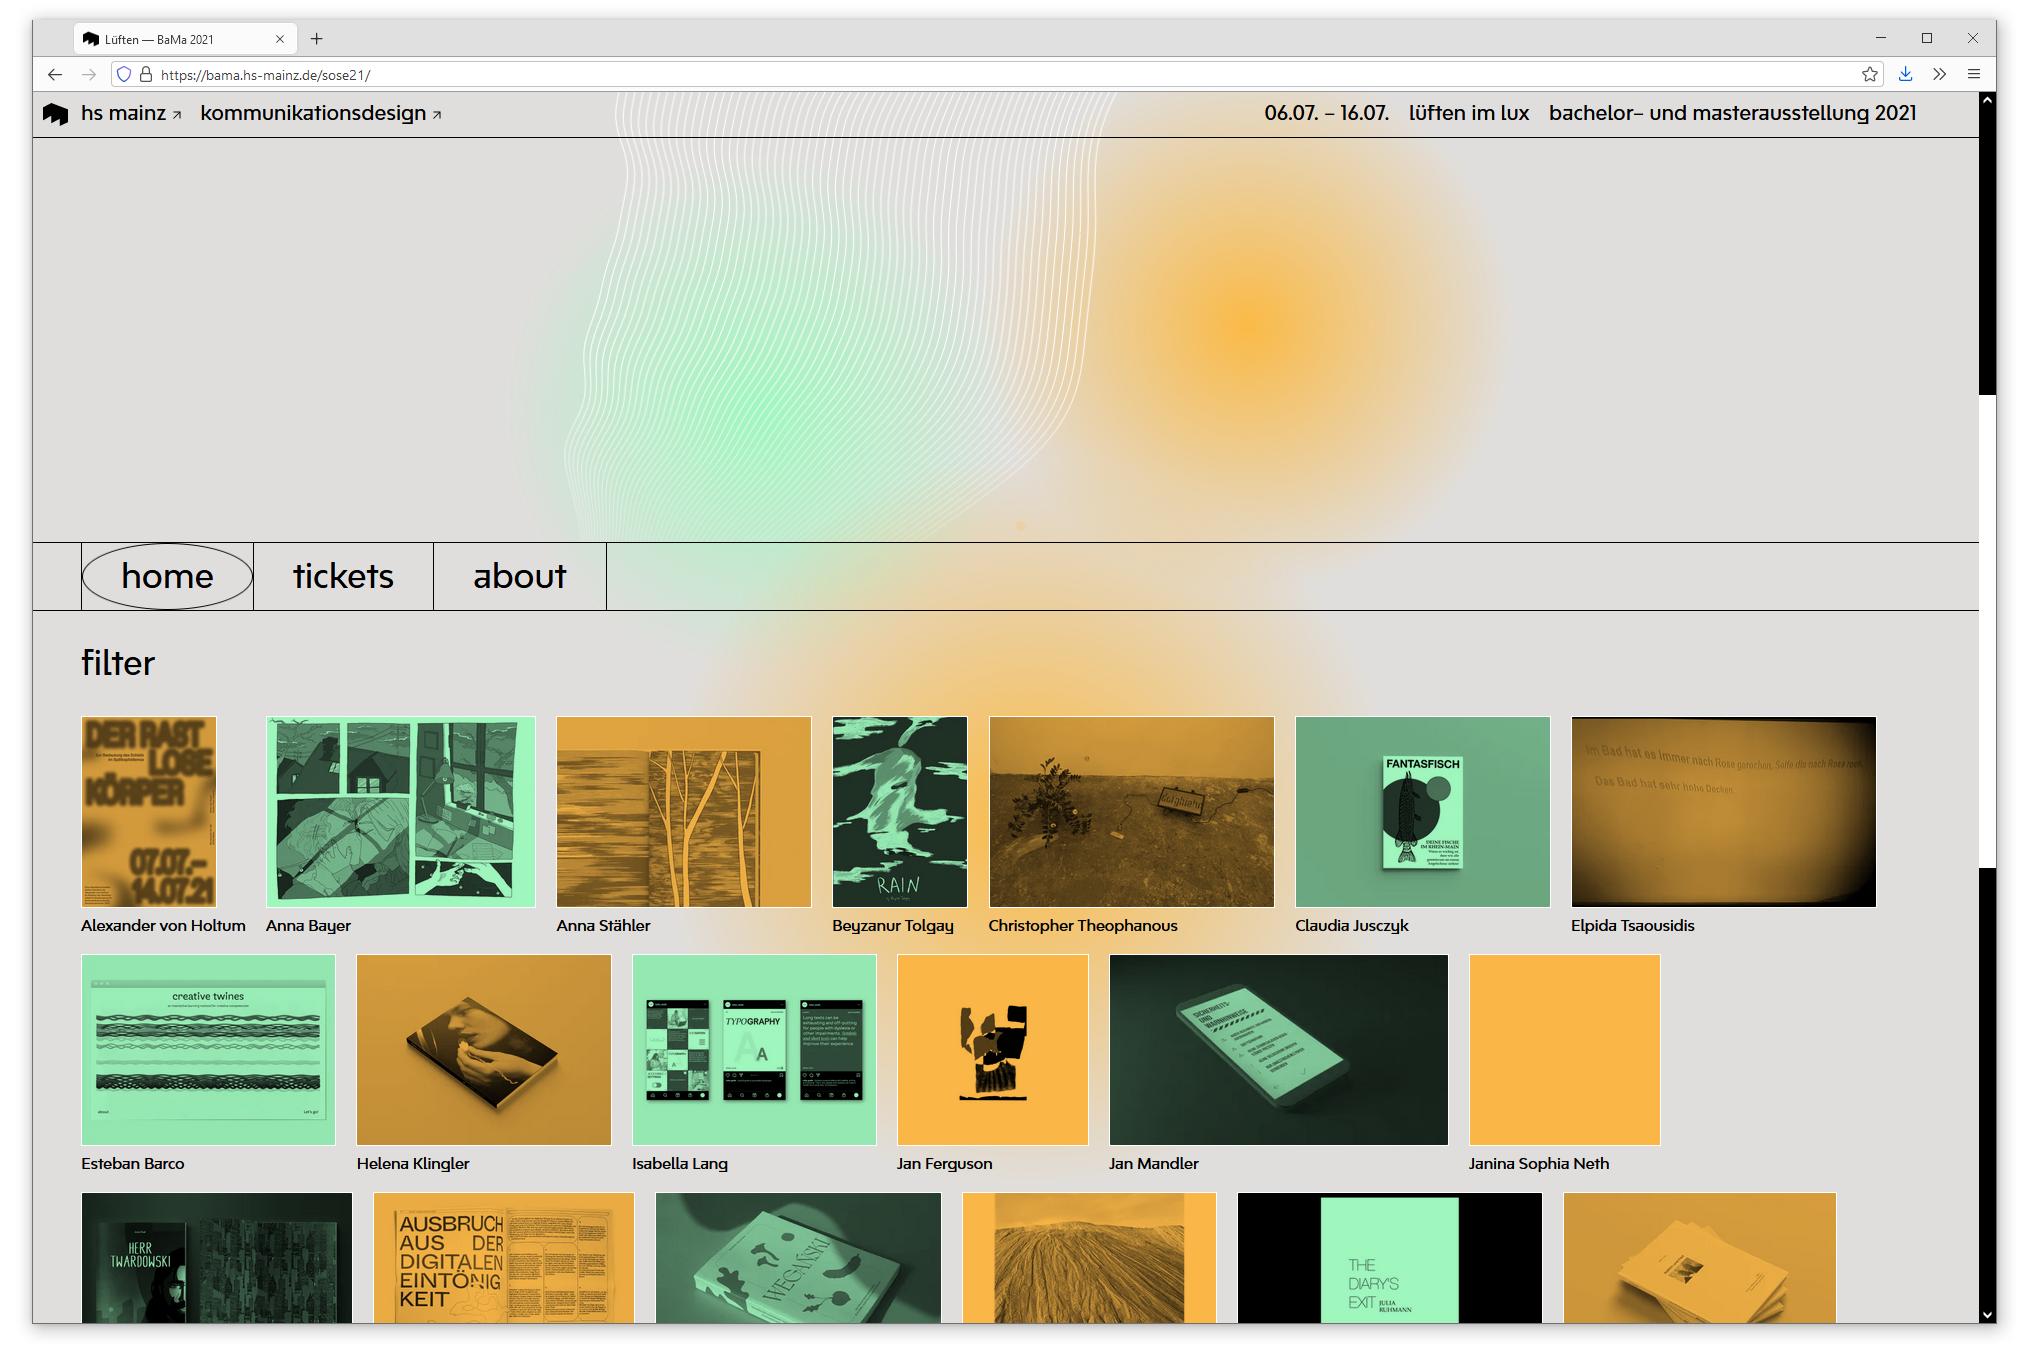 Browser screenshot showing degree show website